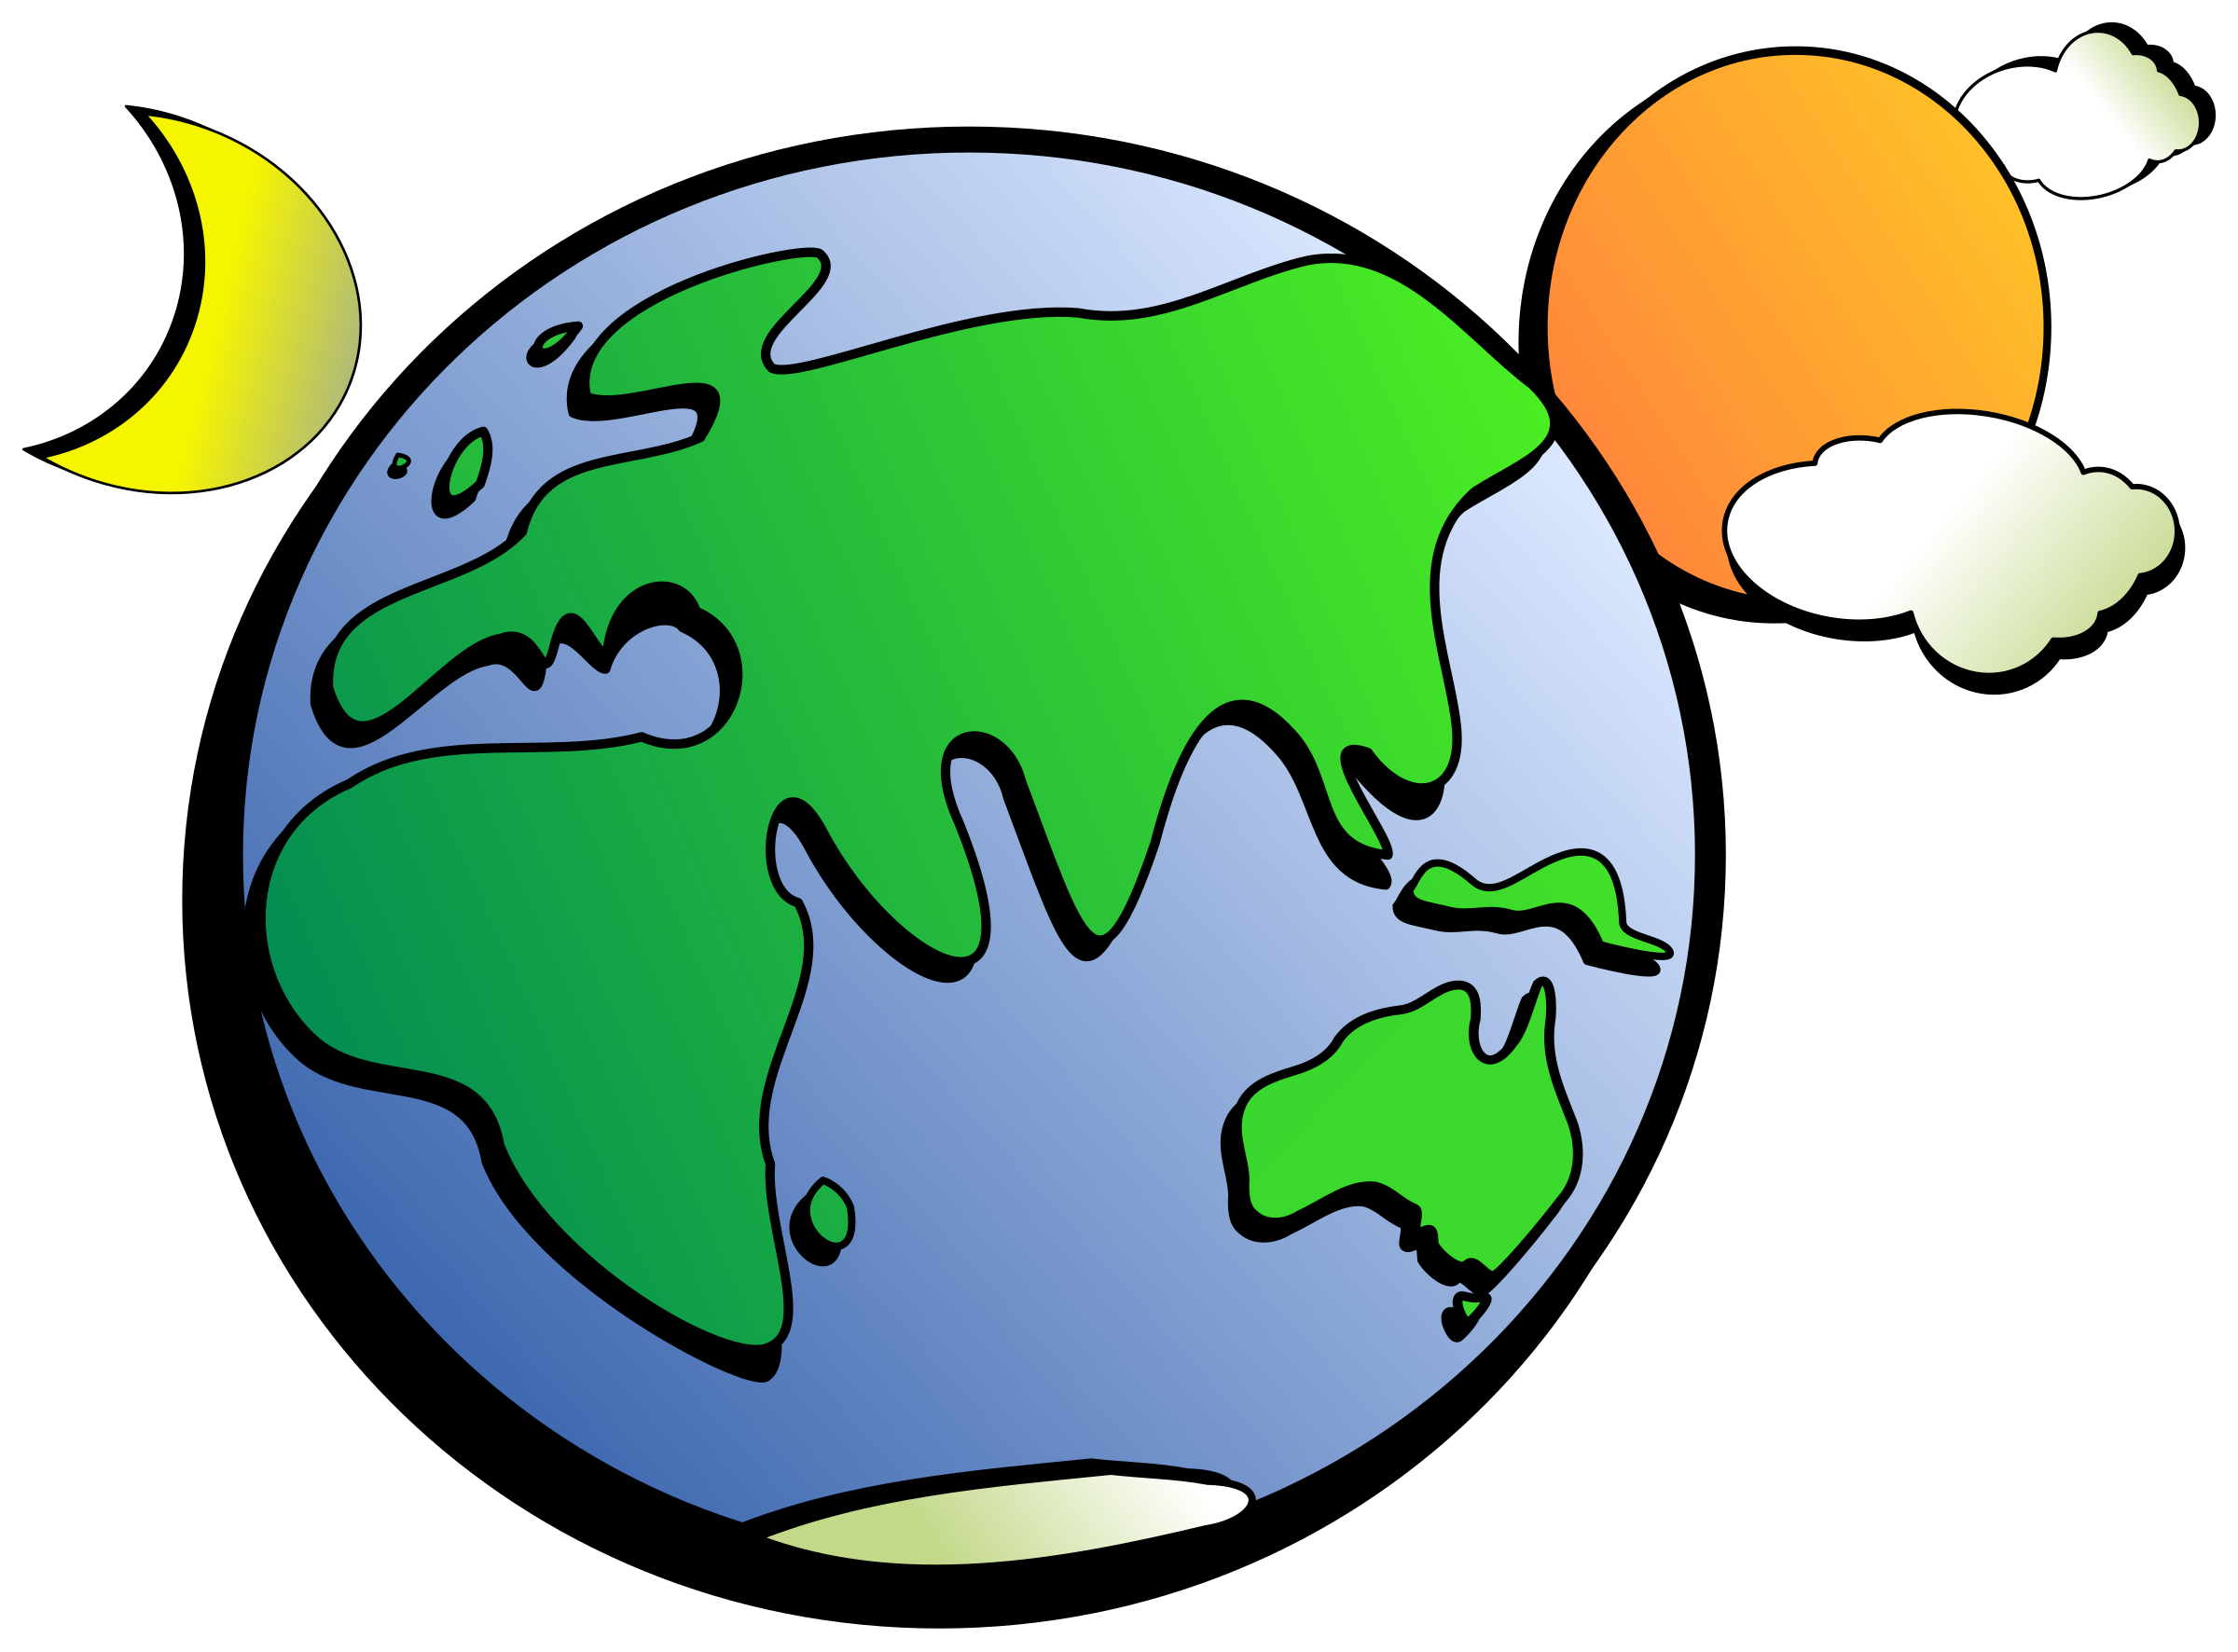 Clipart earth clip art. Aussie big image png